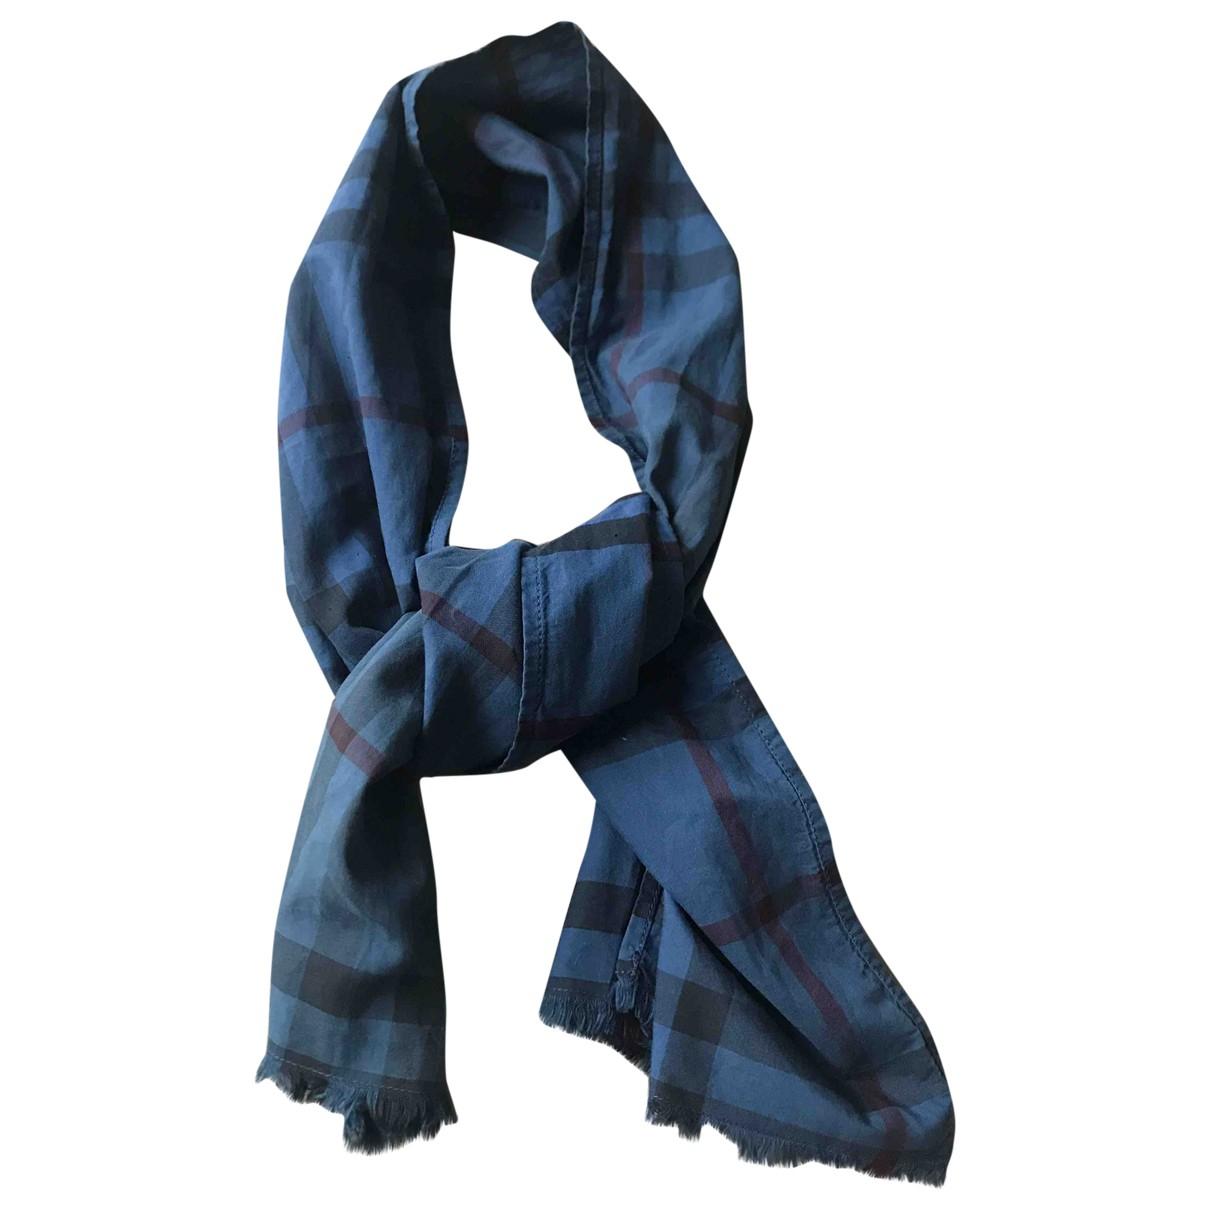 Burberry \N Tuecher, Schal in  Blau Baumwolle